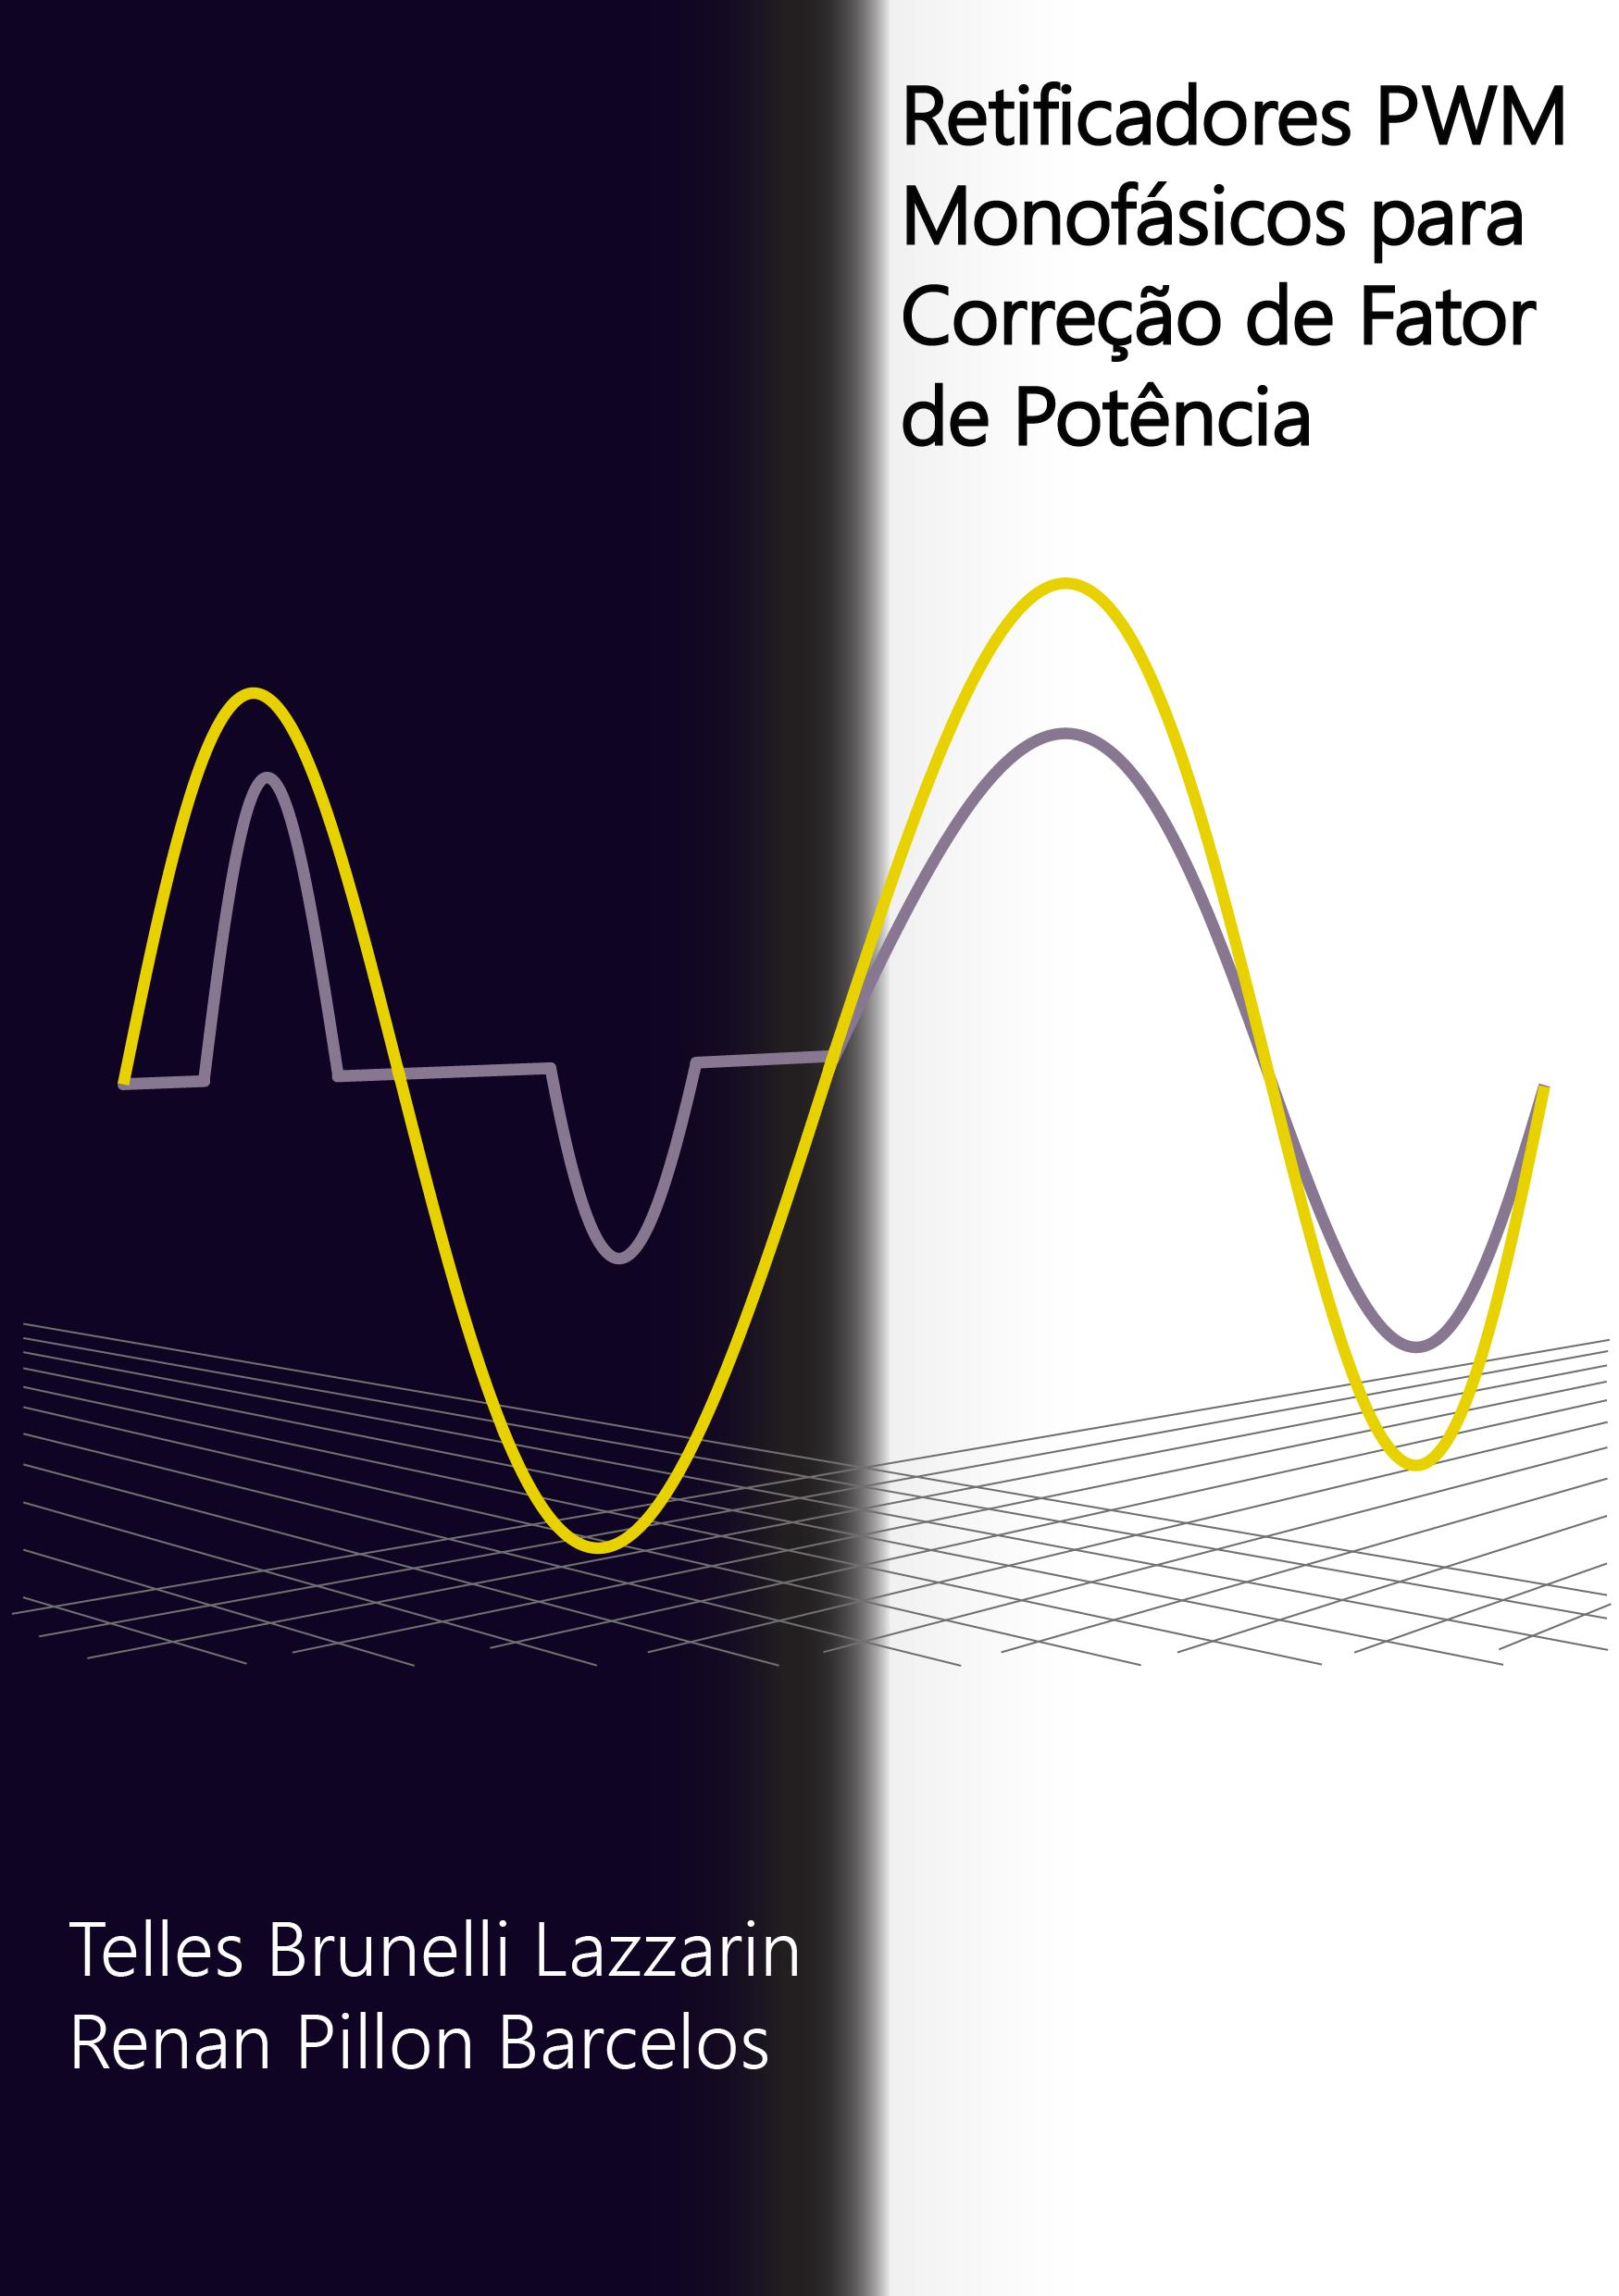 Lançamento de livro do professor Telles Brunelli Lazzarin e mestrando Renan Pillon Barcelos